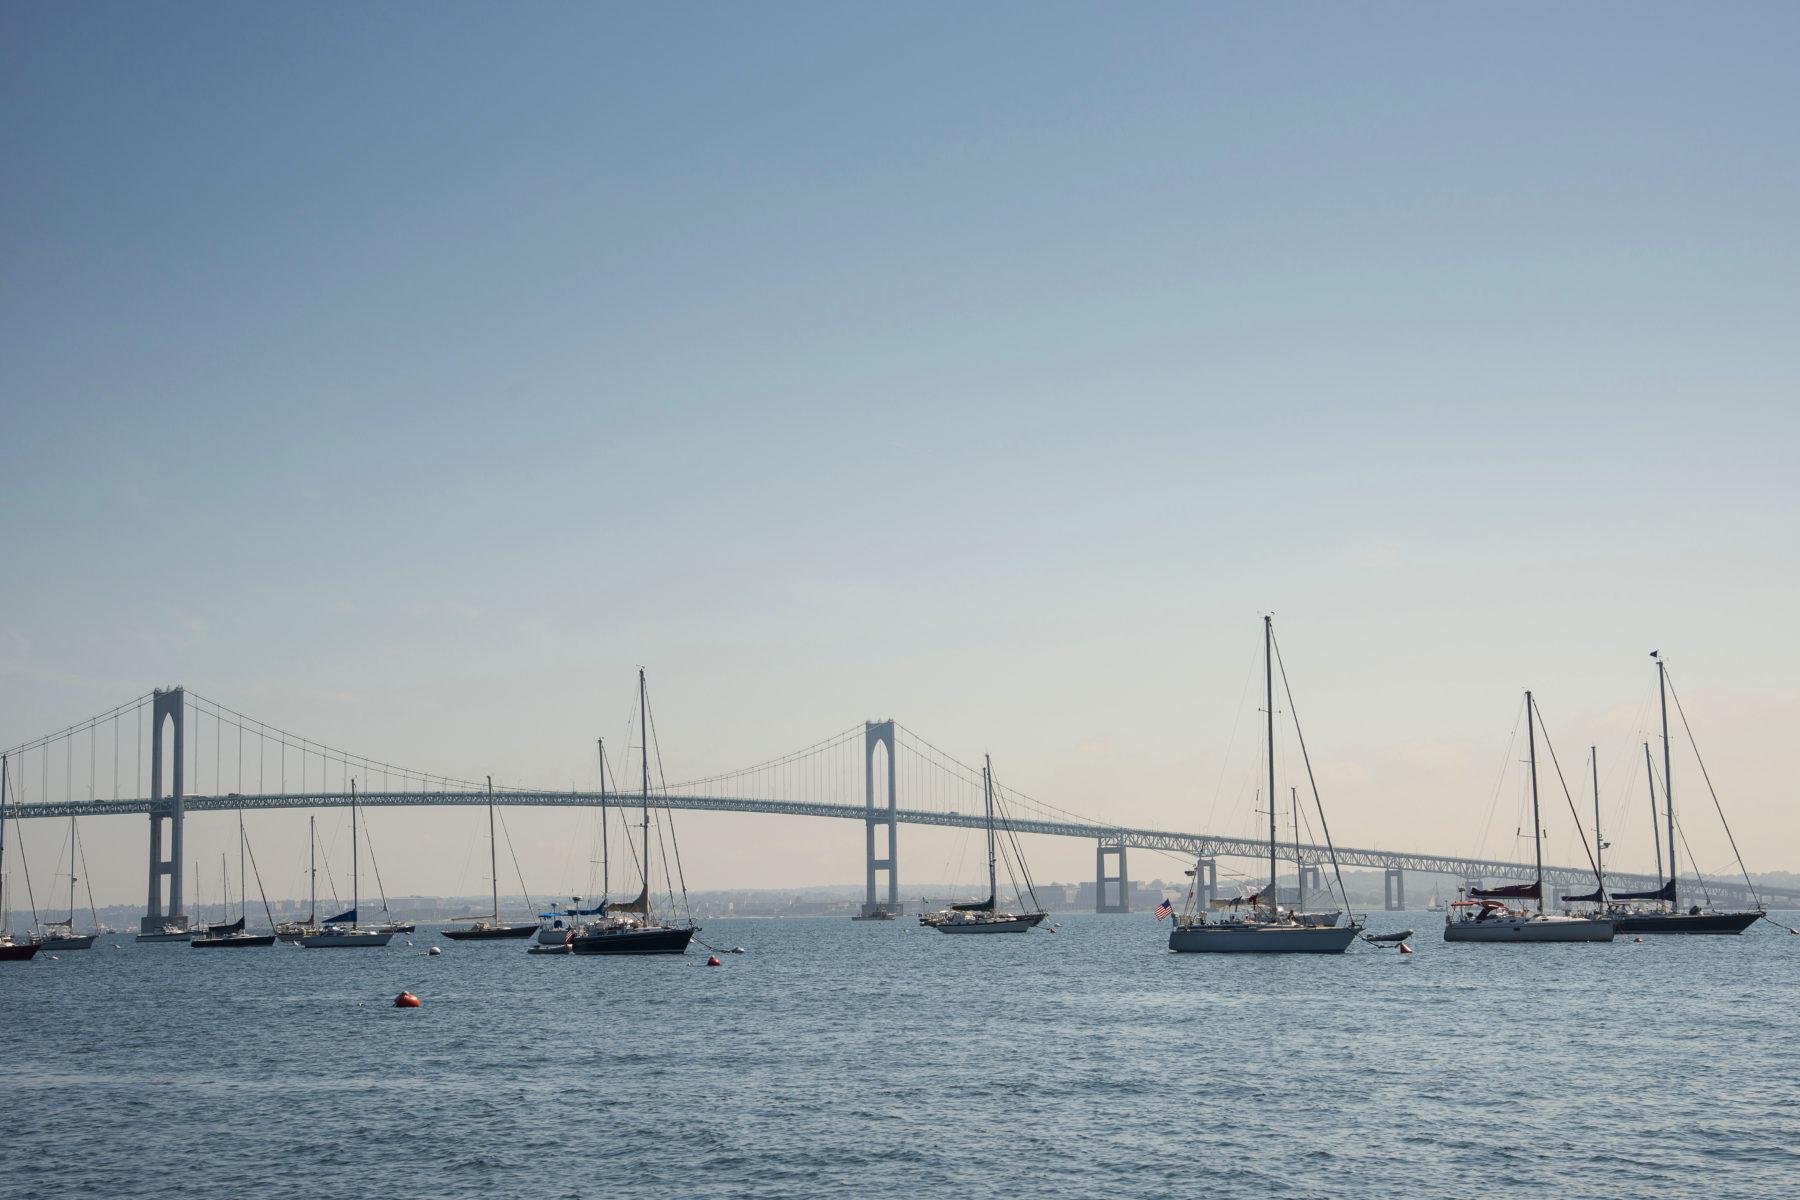 Sailboats in Narragansett Bay